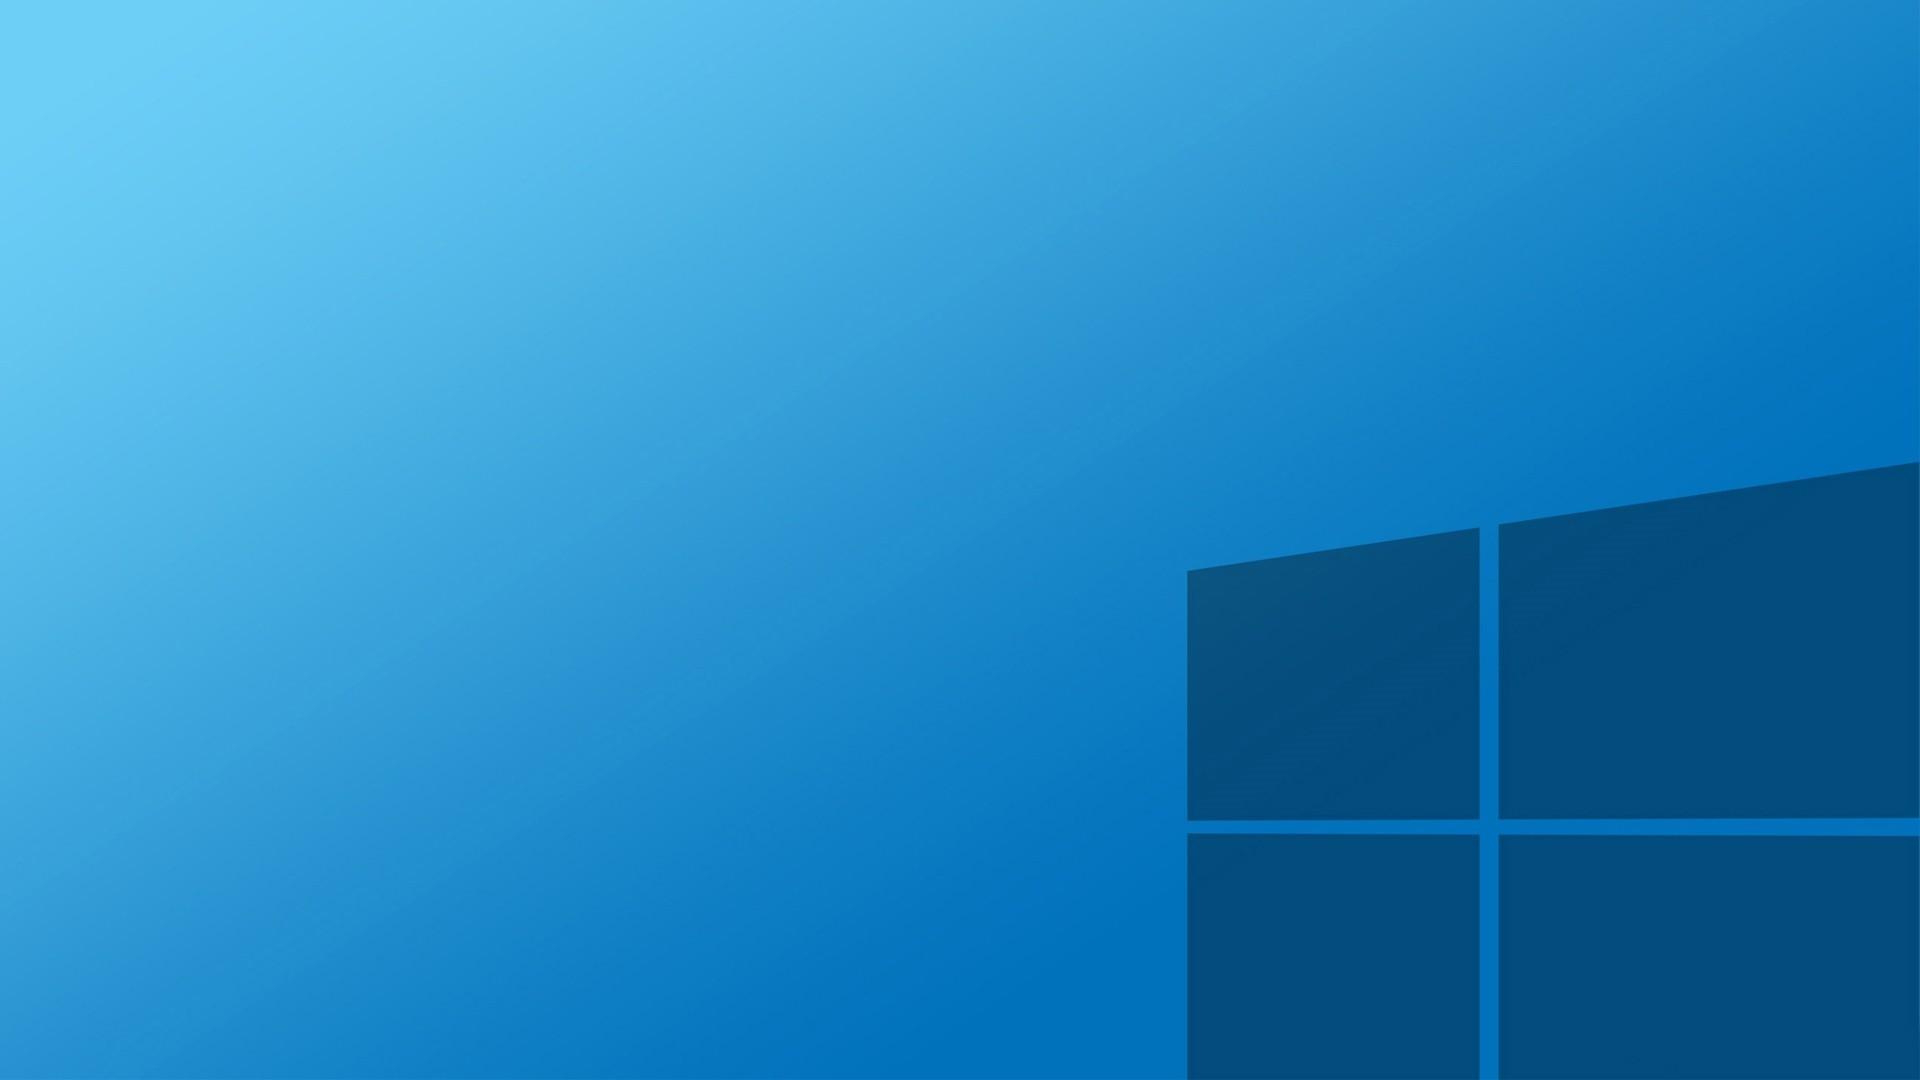 Microsoft wallpaper